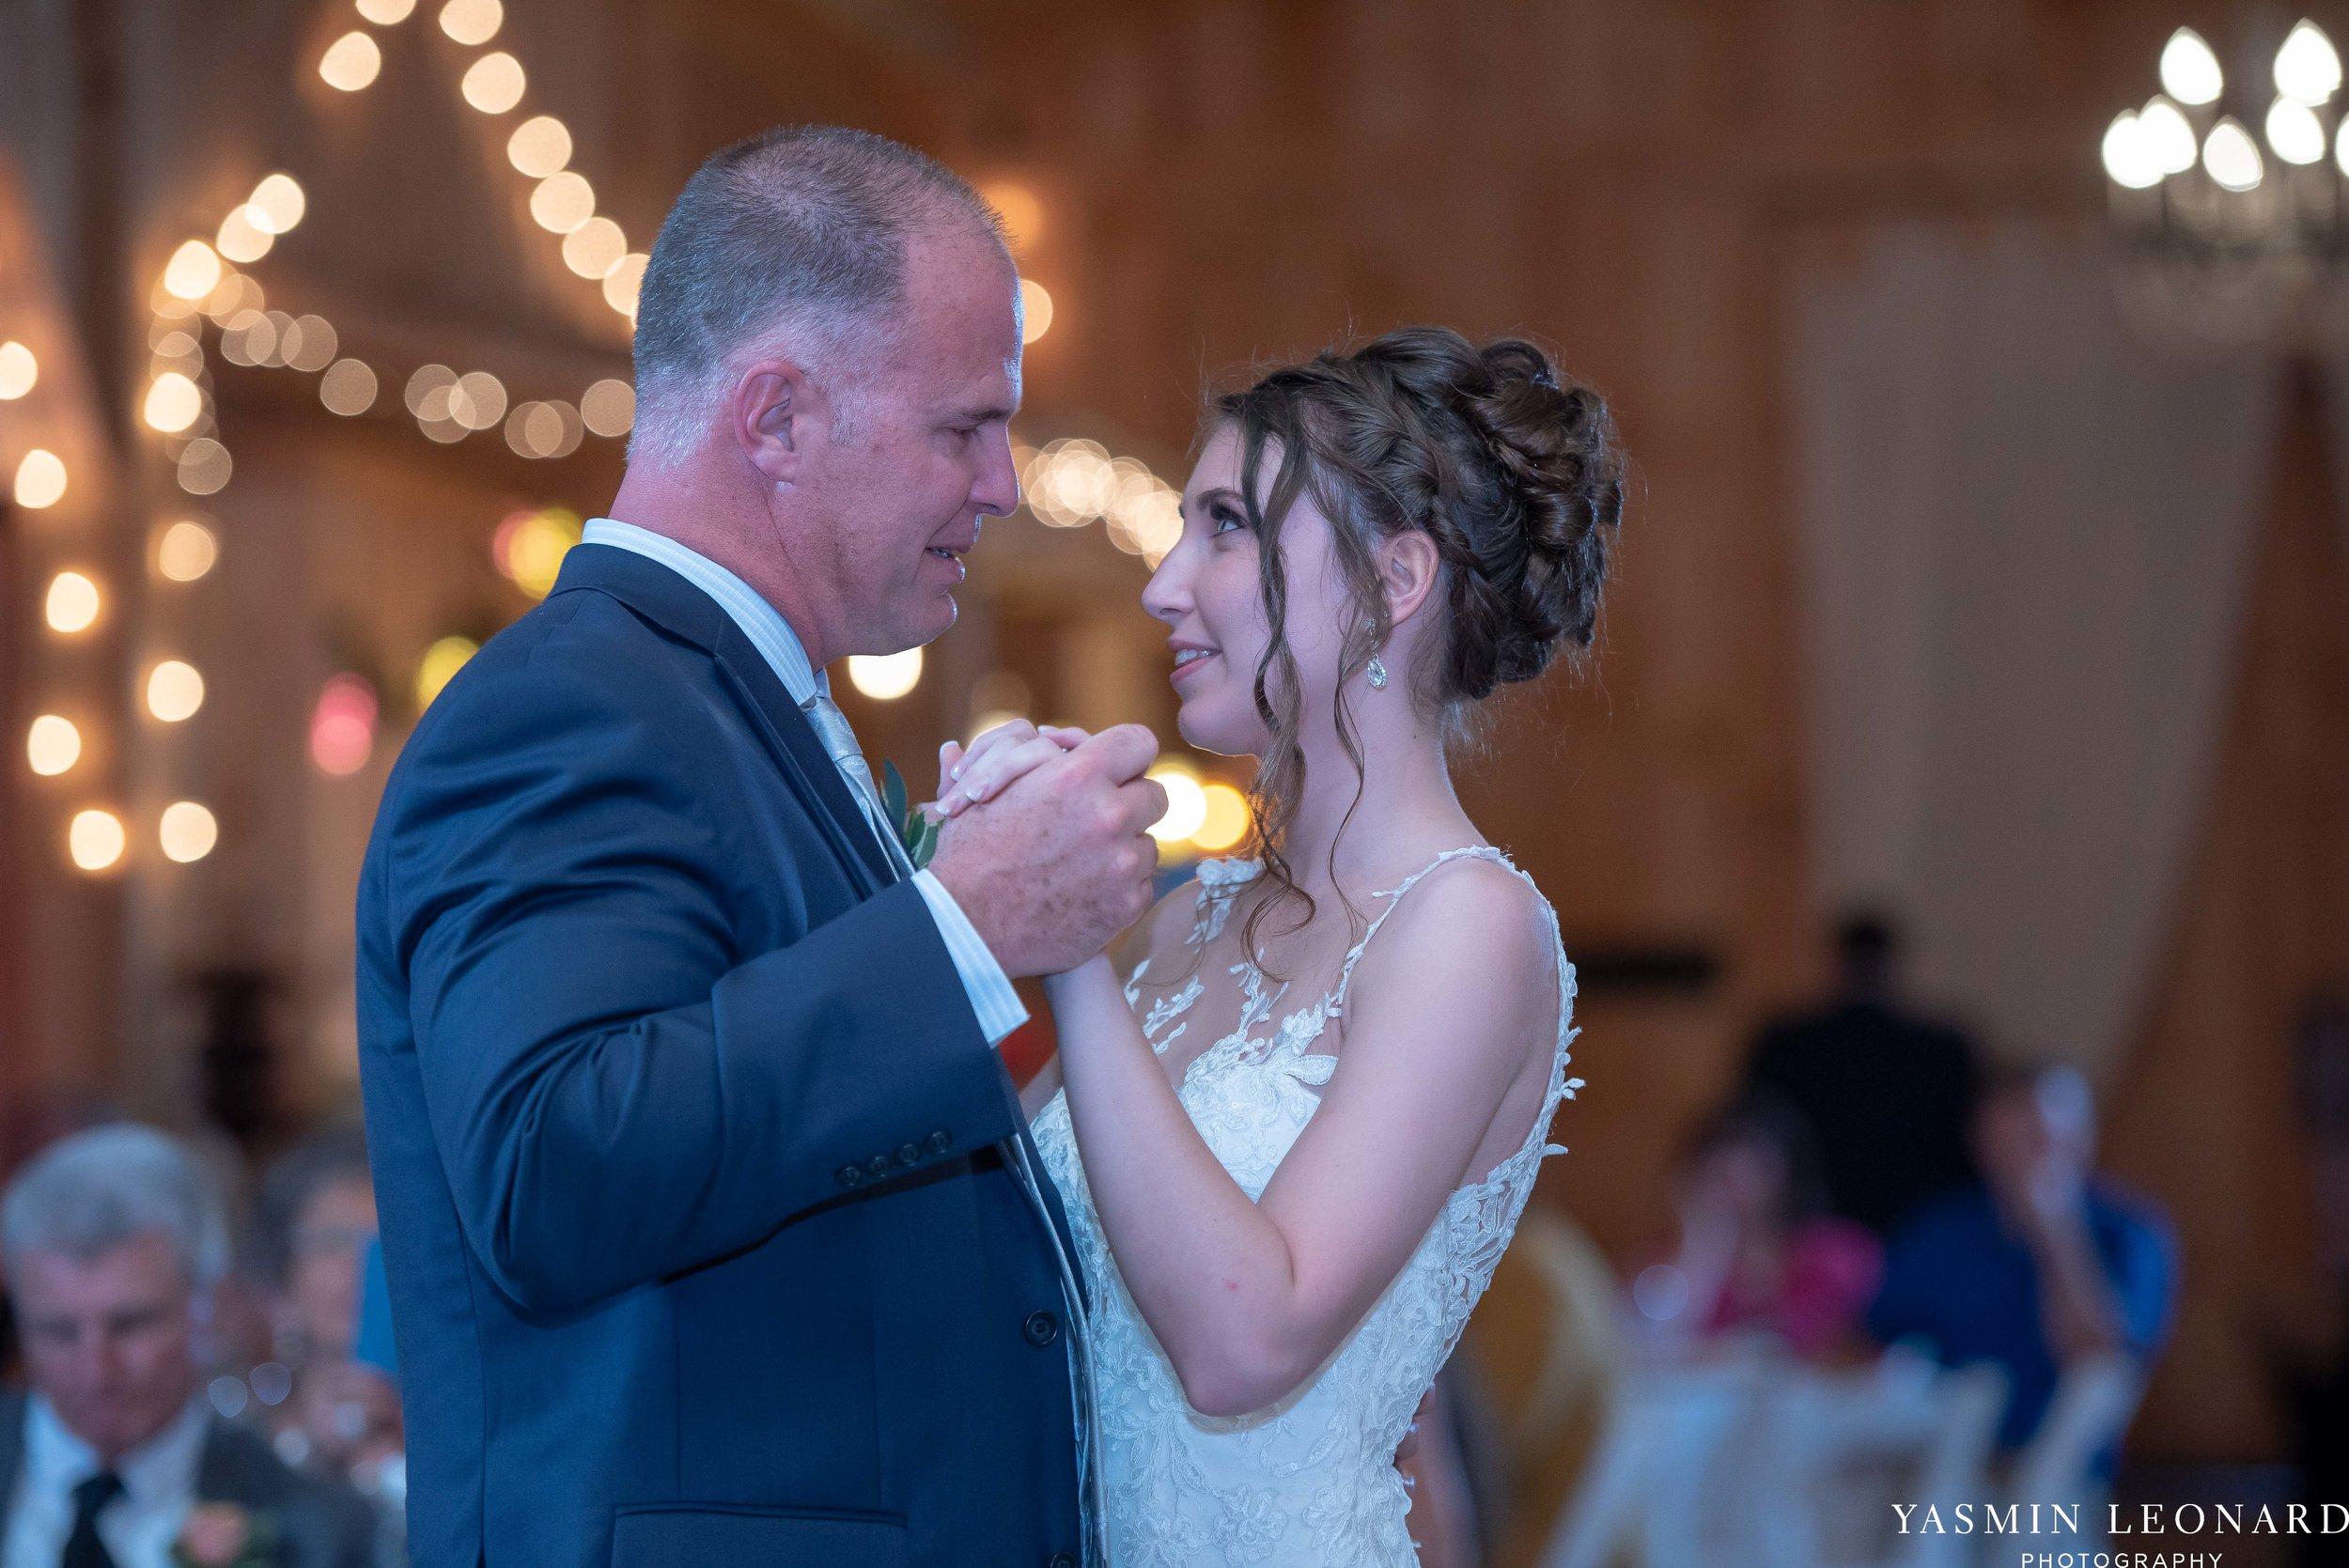 Old Homeplace Vineyard - NC Weddings - Outdoor Summer Weddings - Peony Boutique - Vineyard Wedding - NC Photographer - Yasmin Leonard Photography-70.jpg